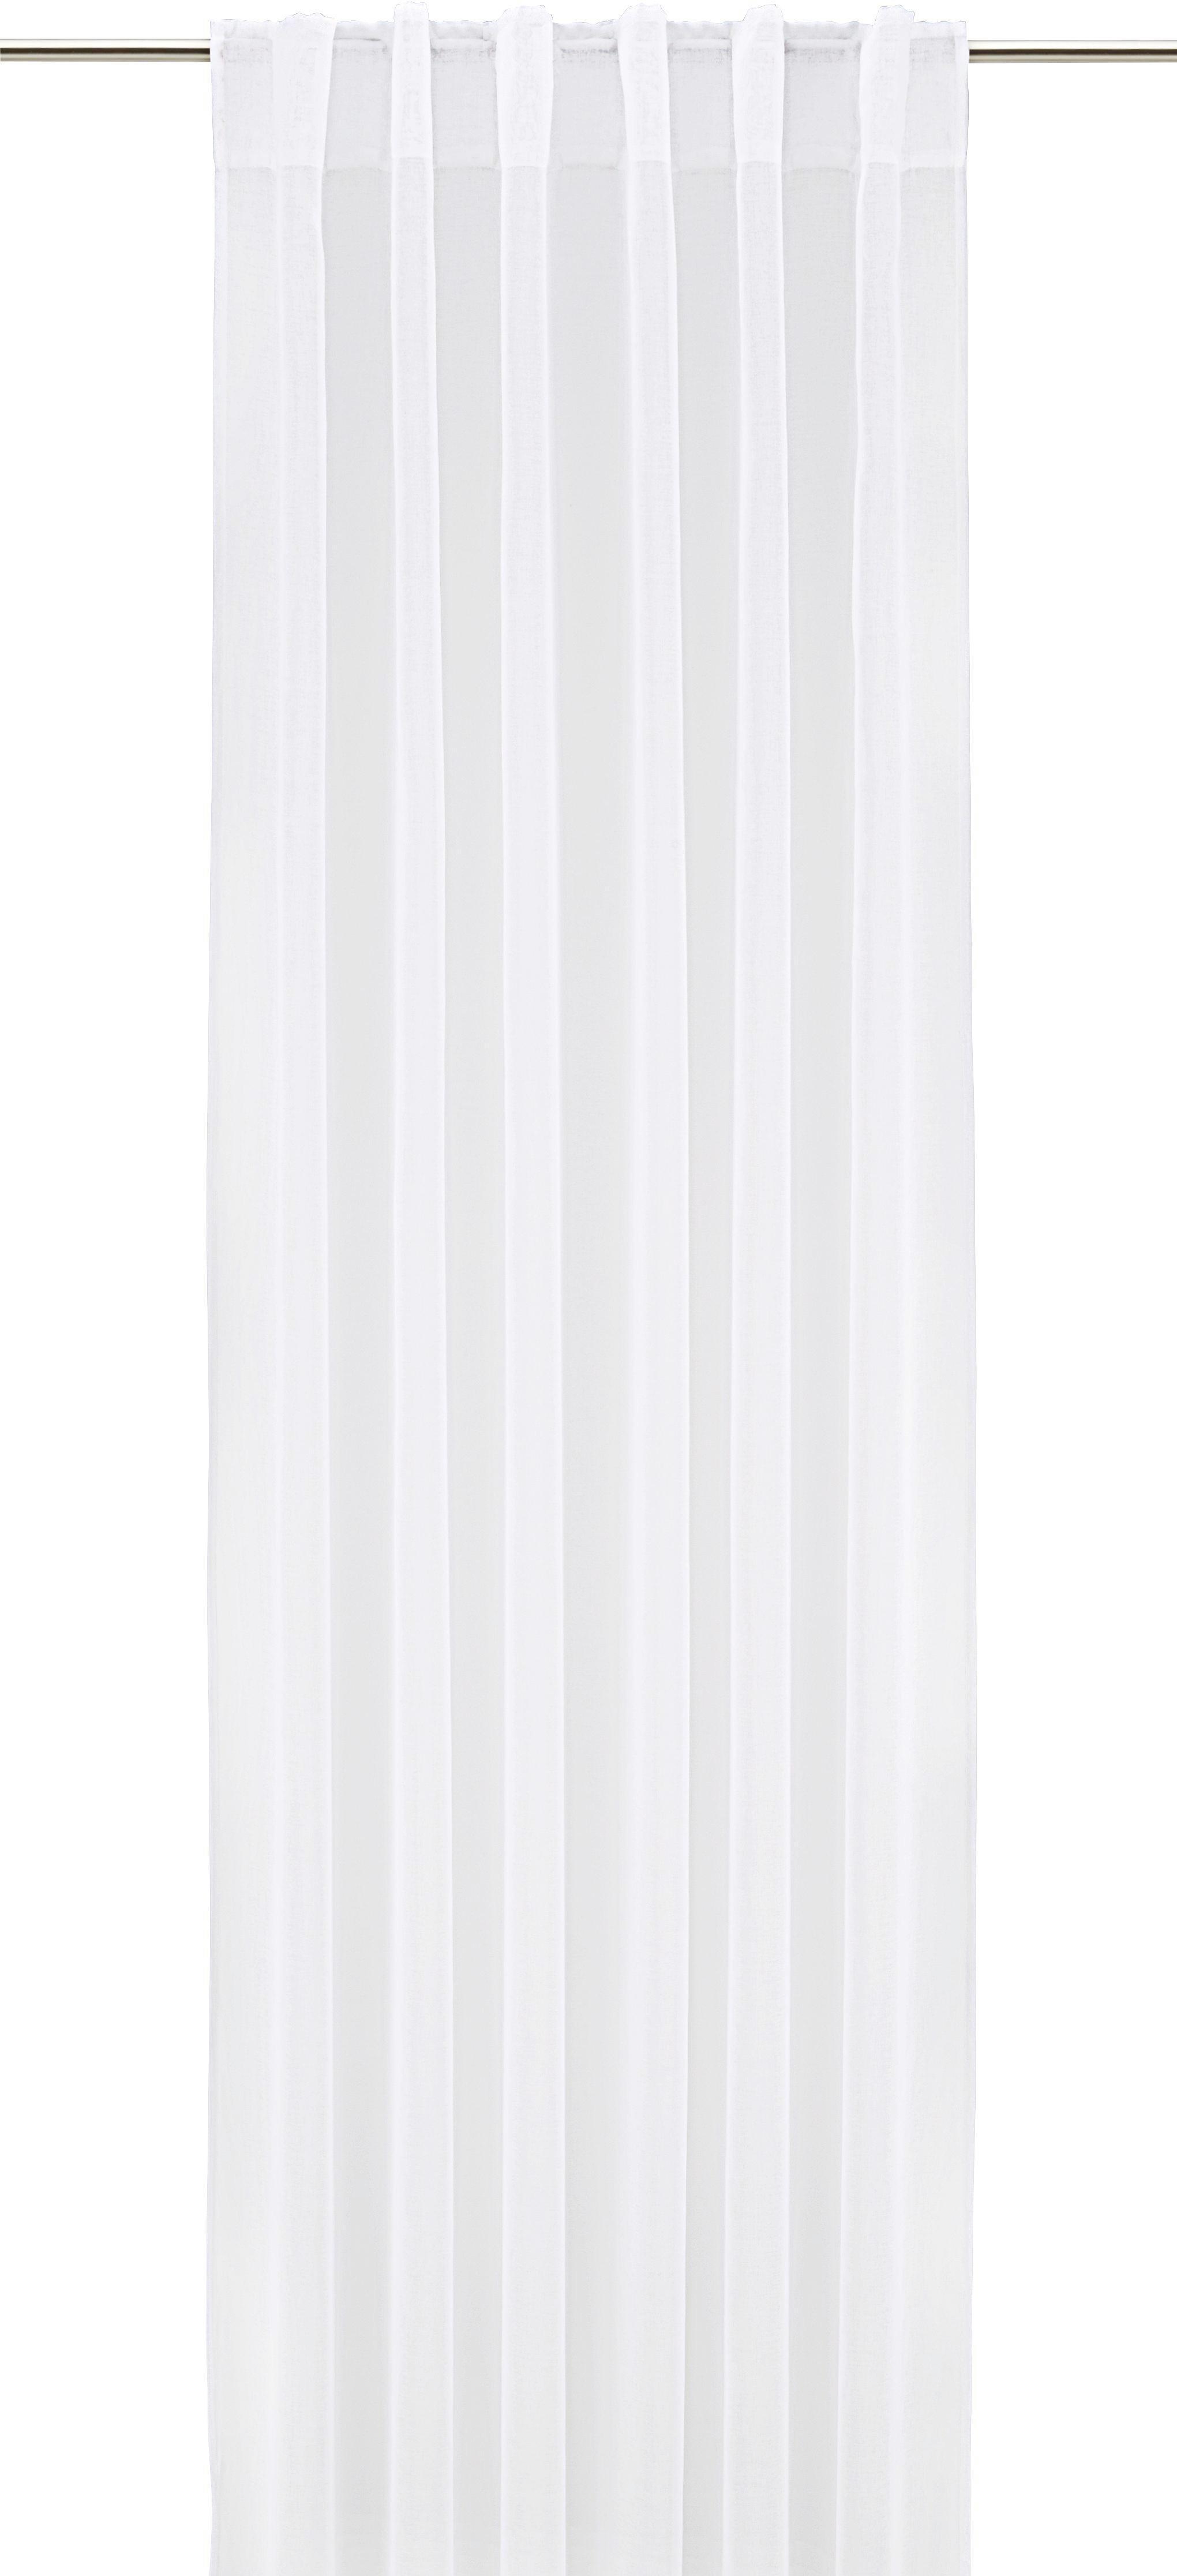 Fertigvorhang Tosca in Weiß, ca. 140x245cm - Weiß, Textil (140/245cm) - MÖMAX modern living